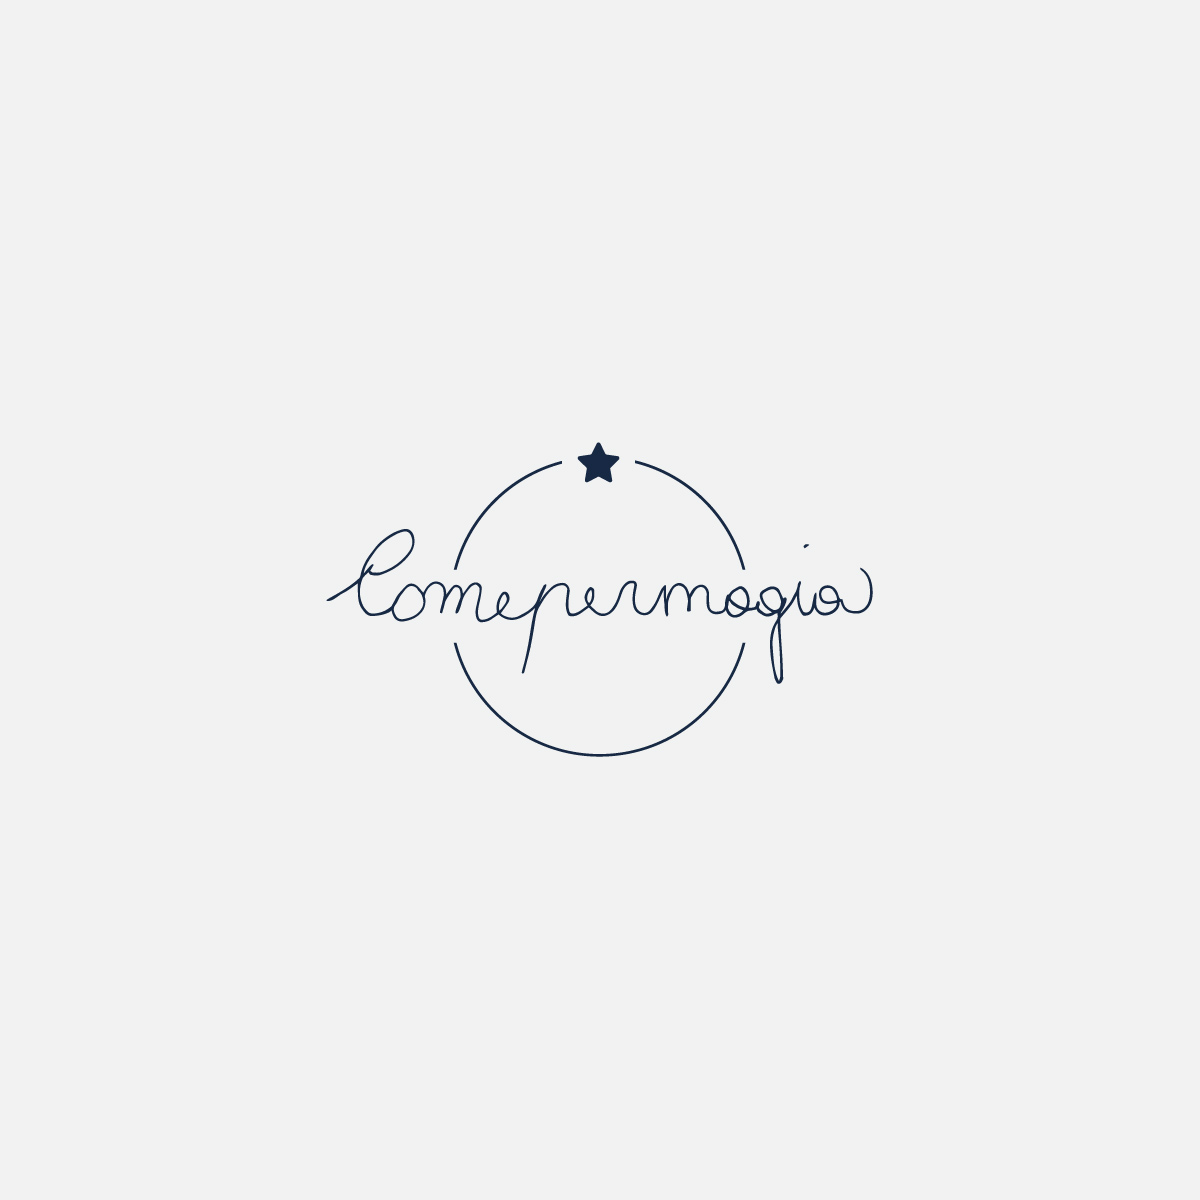 ComePerMaggia_2